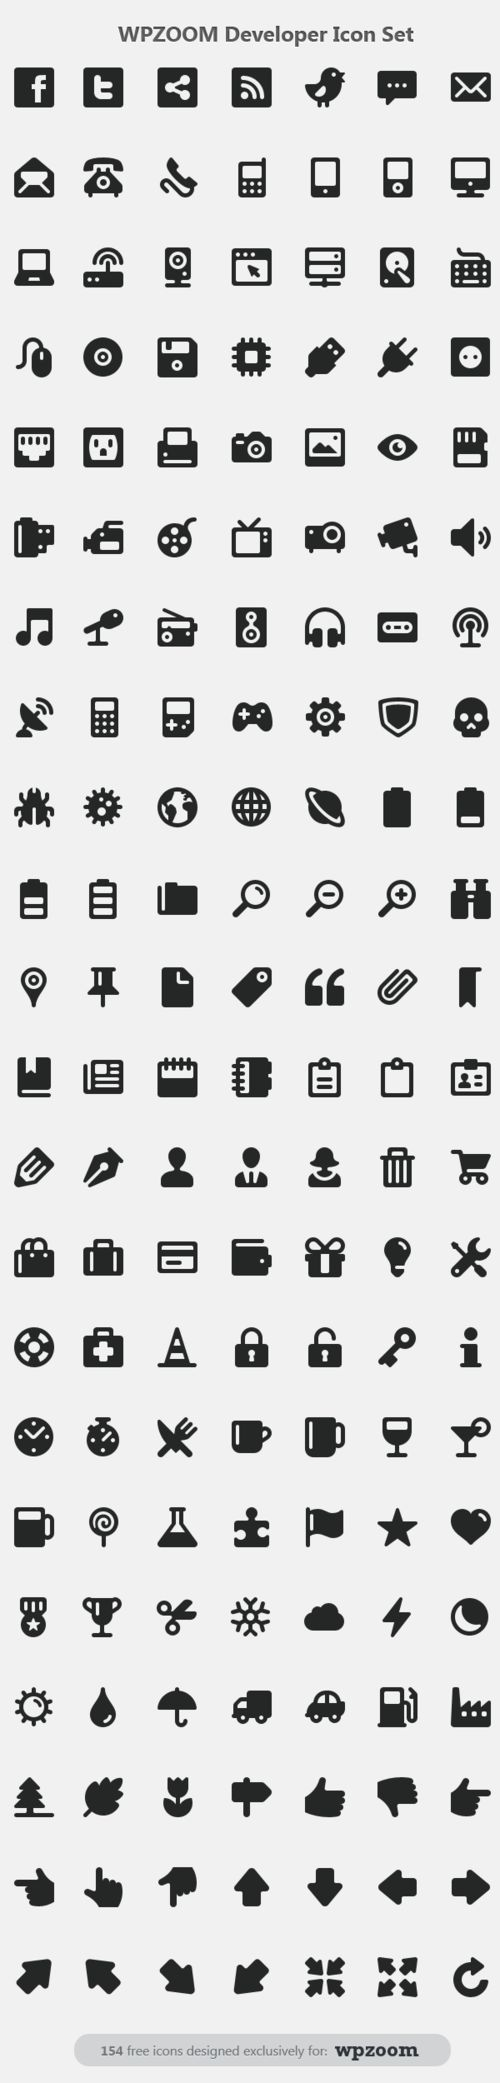 icon set #usefull #resource #resources #freebie #free #psd